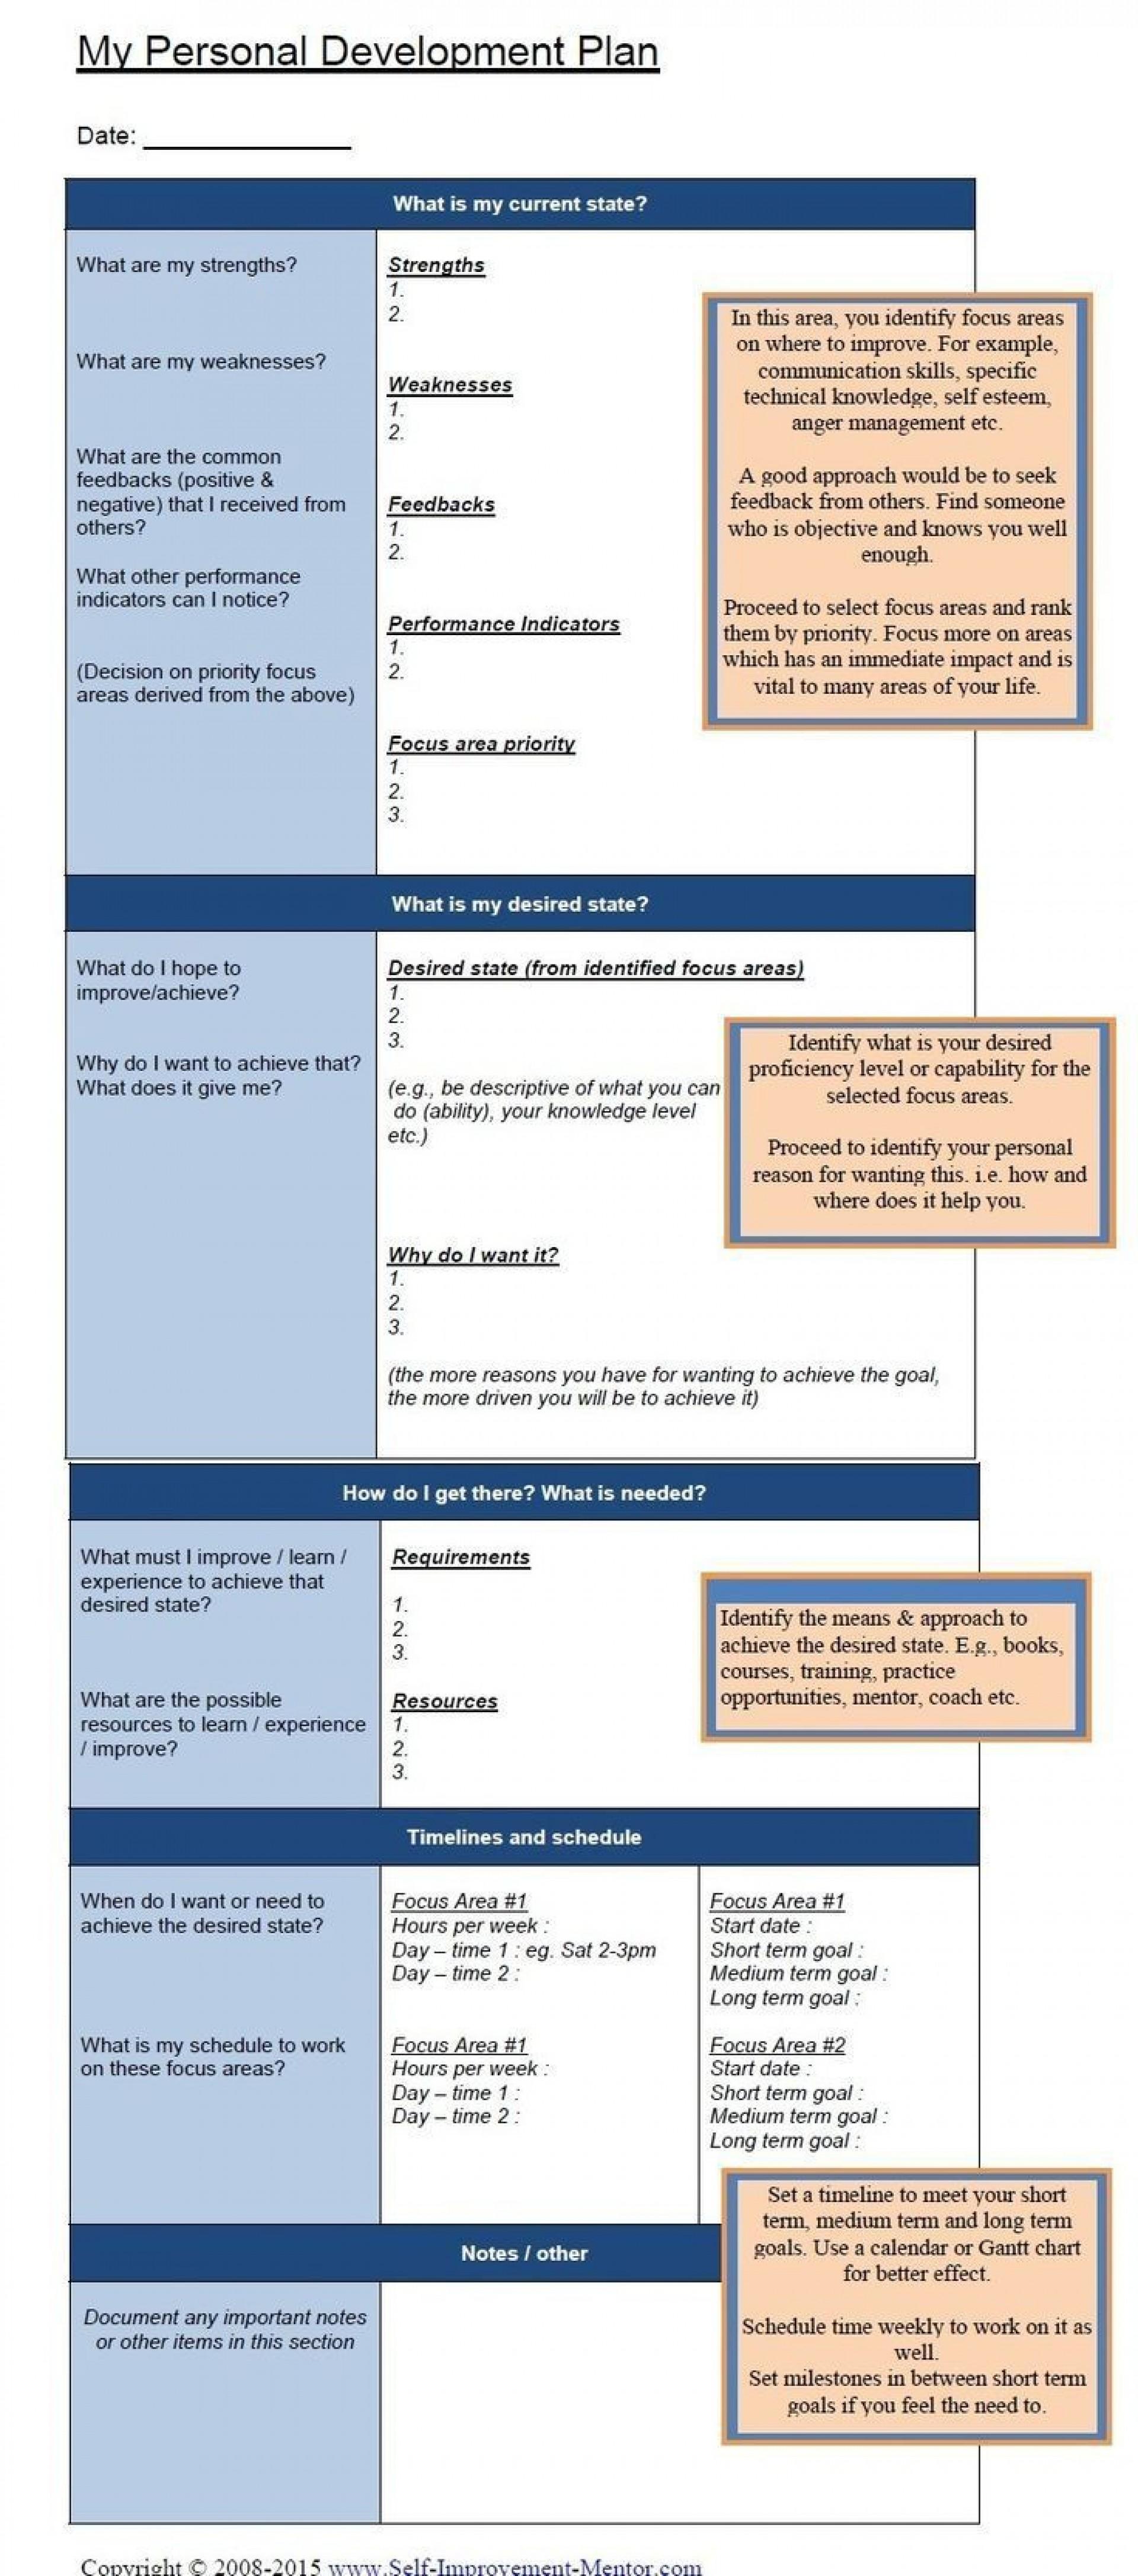 002 Rare Personal Development Plan Example Professional Doc Image 1920